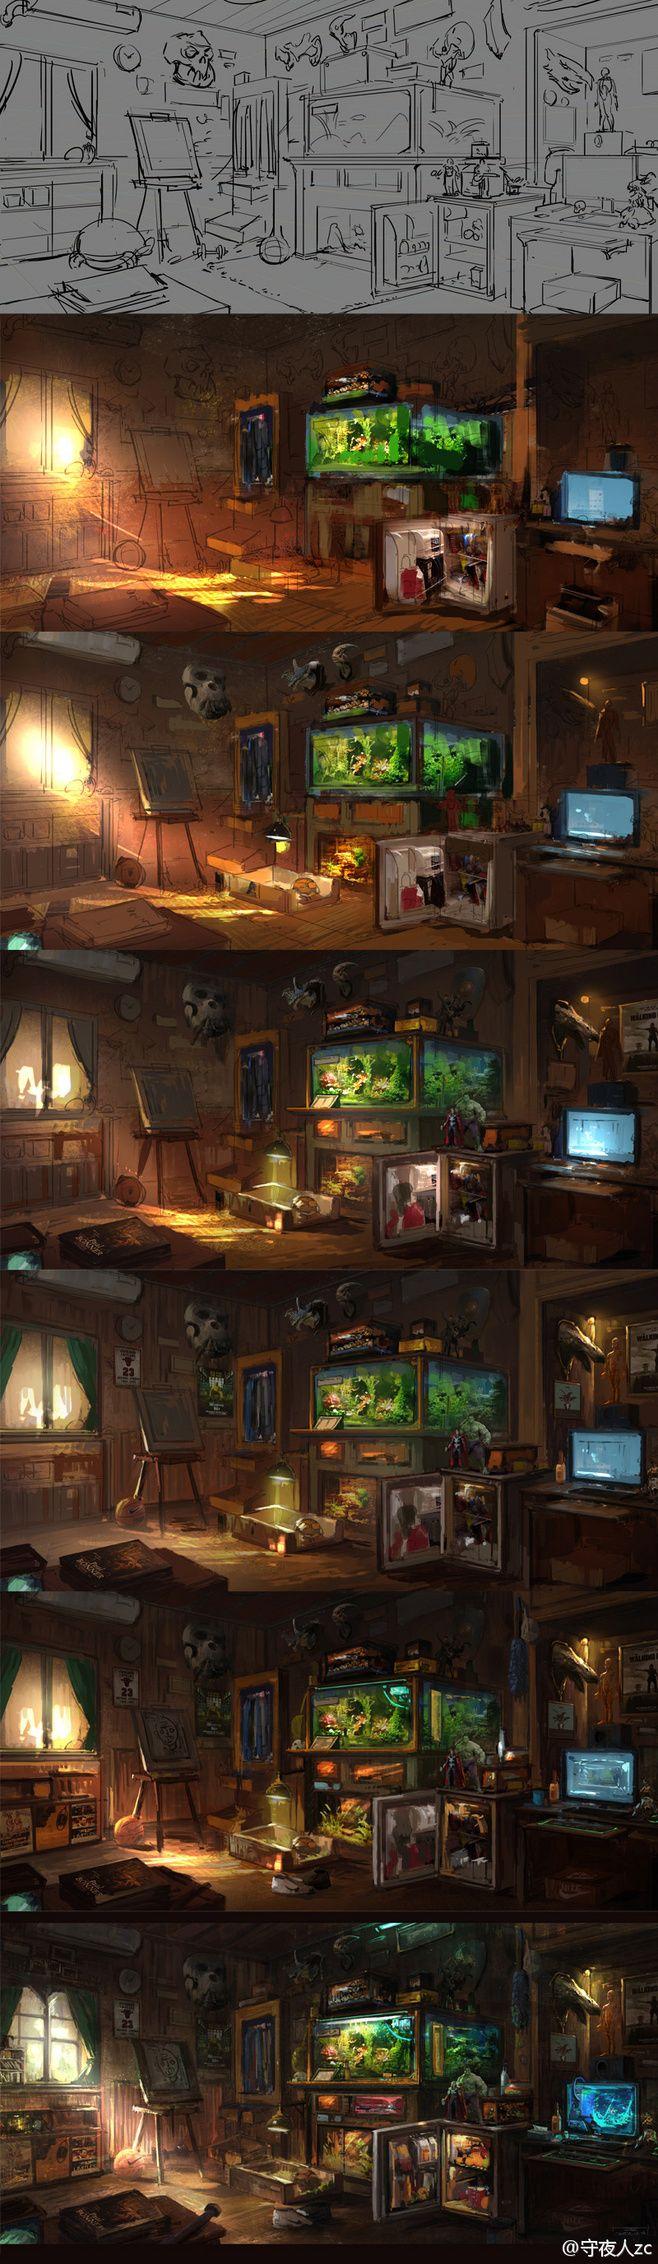 守夜人zc的照片 - 微相册 Room Interior - Digital Painting Step-by-Step Workshop